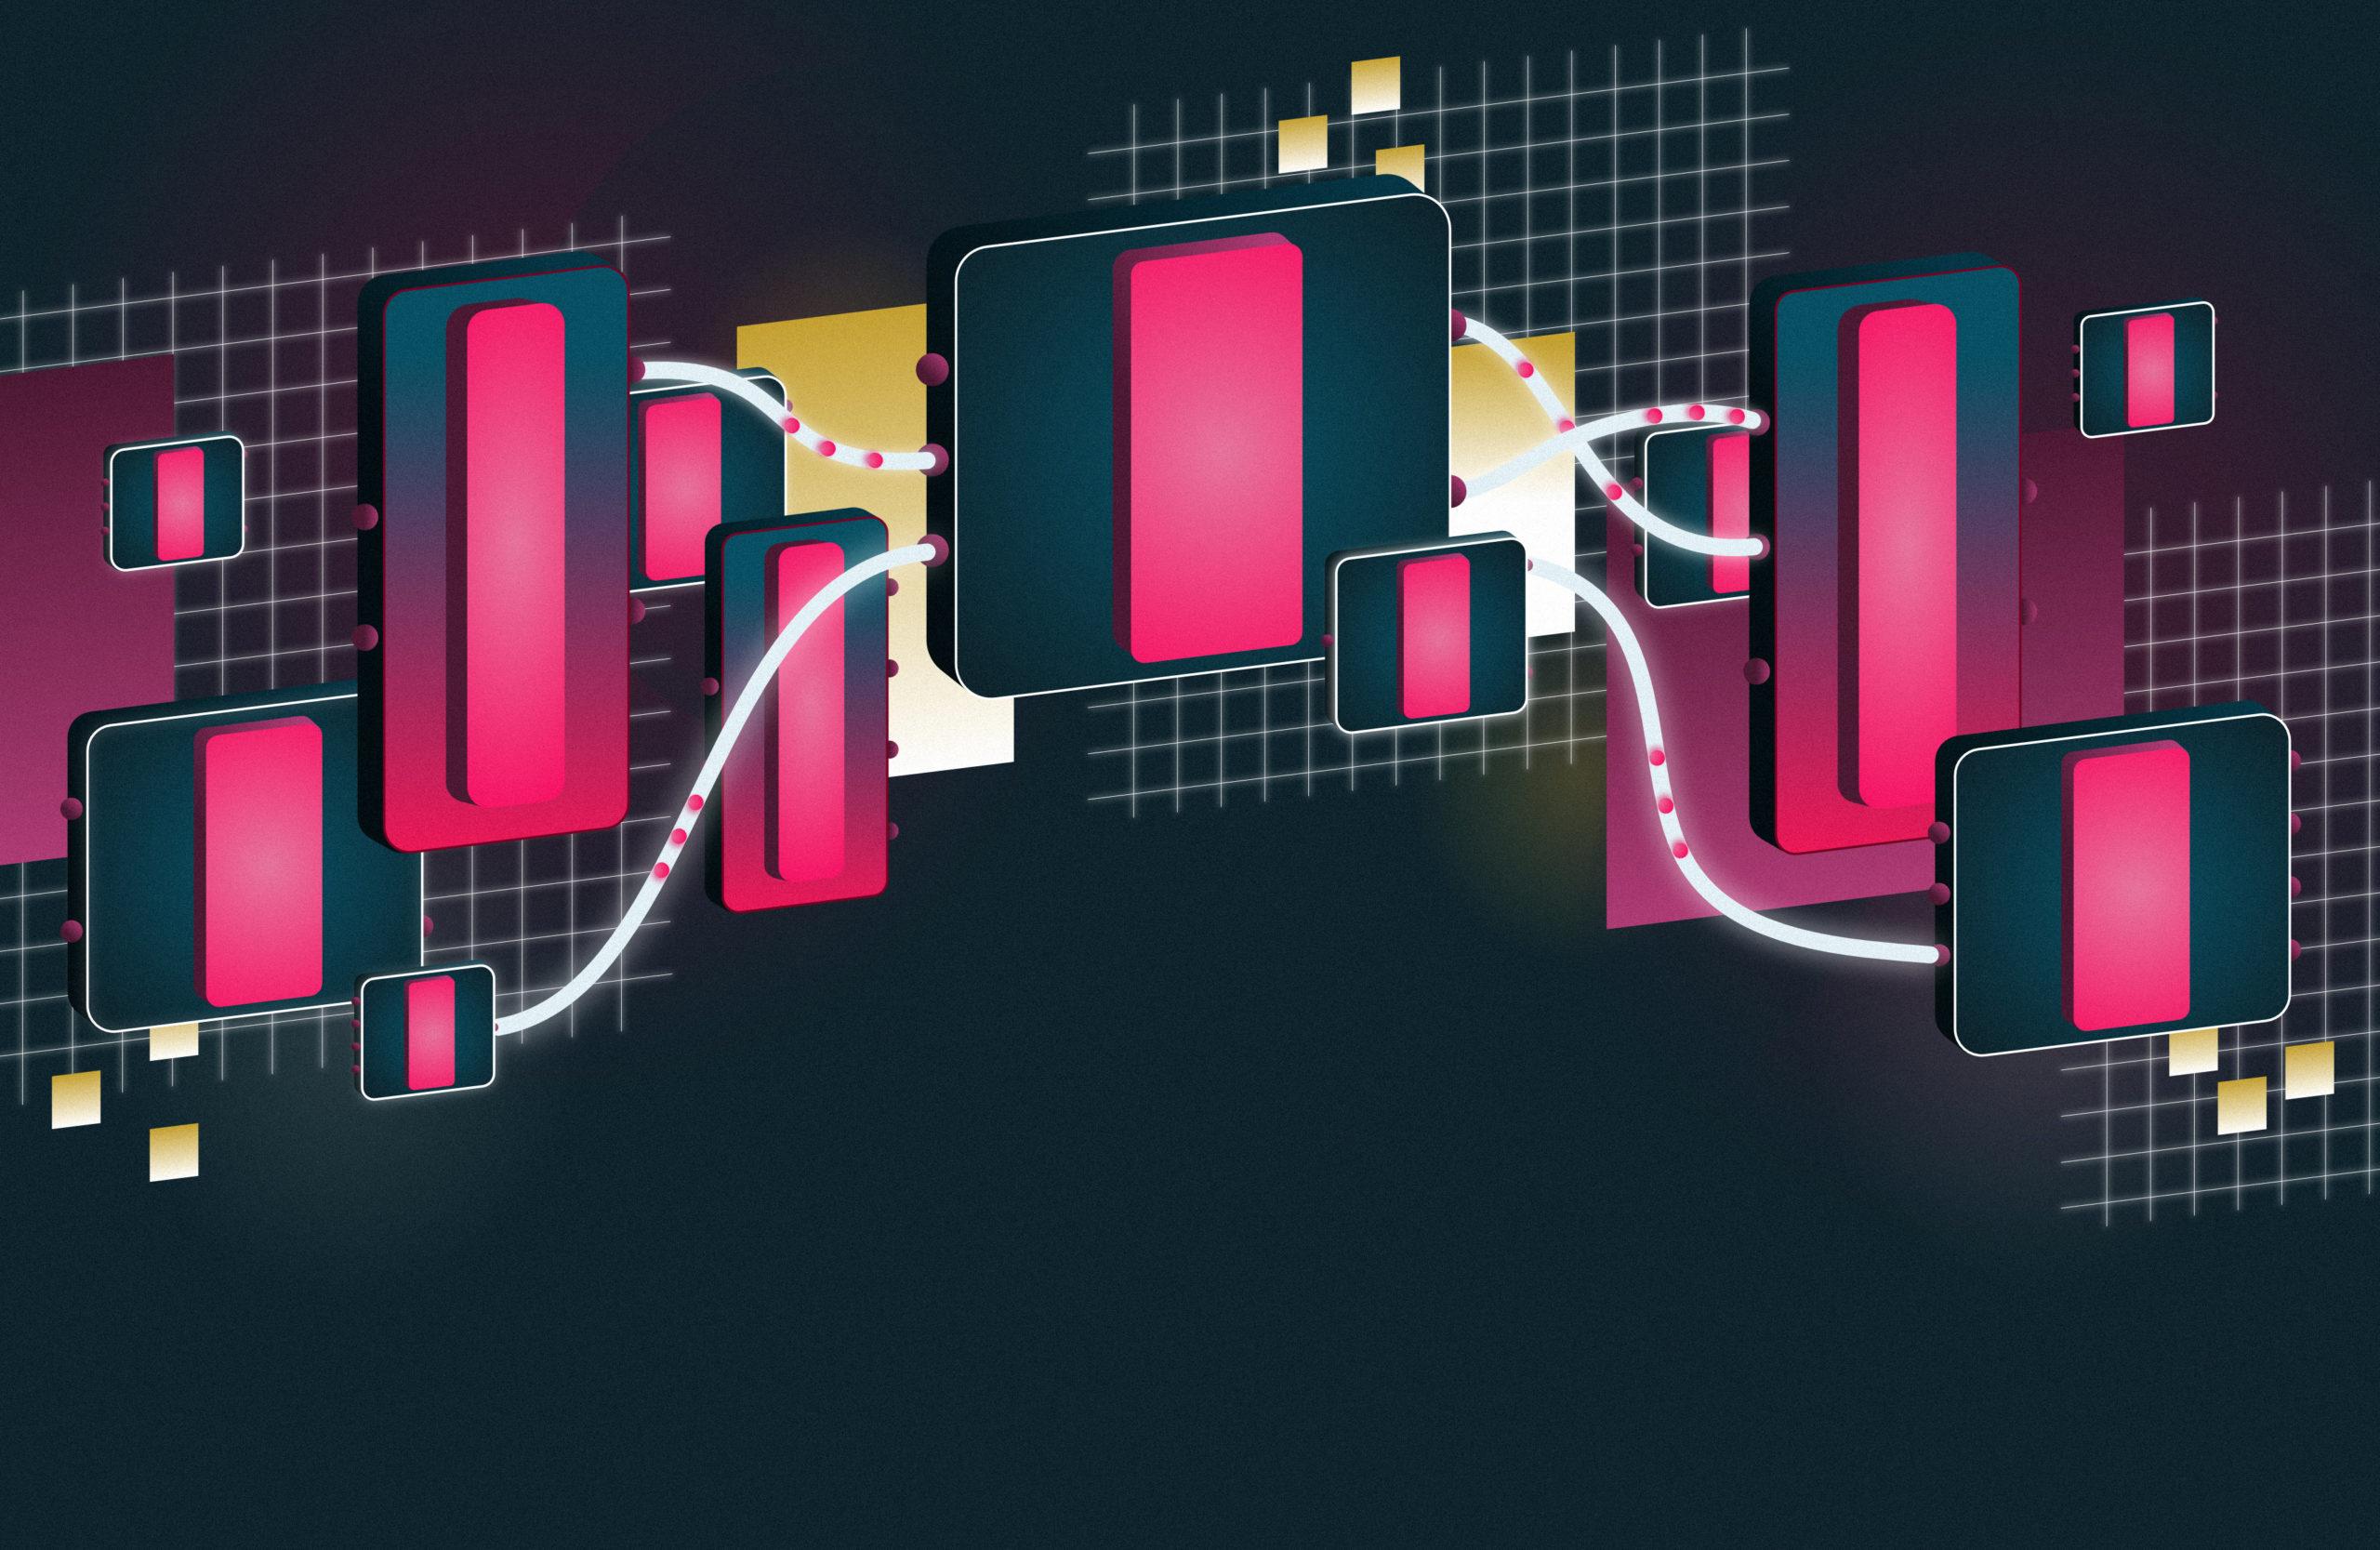 Parametric by Design Illustration